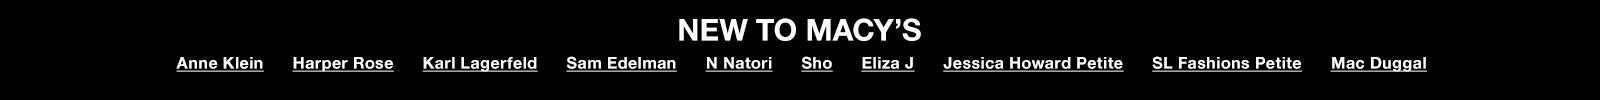 New to Macy's, Anne Klein, Harper Rose, Karl Lagerfeld, Sam Edelman, N Natori, Sho, Eliza J, Jessica Howard Petite, Sl Fashions Petite, Mac Duggal